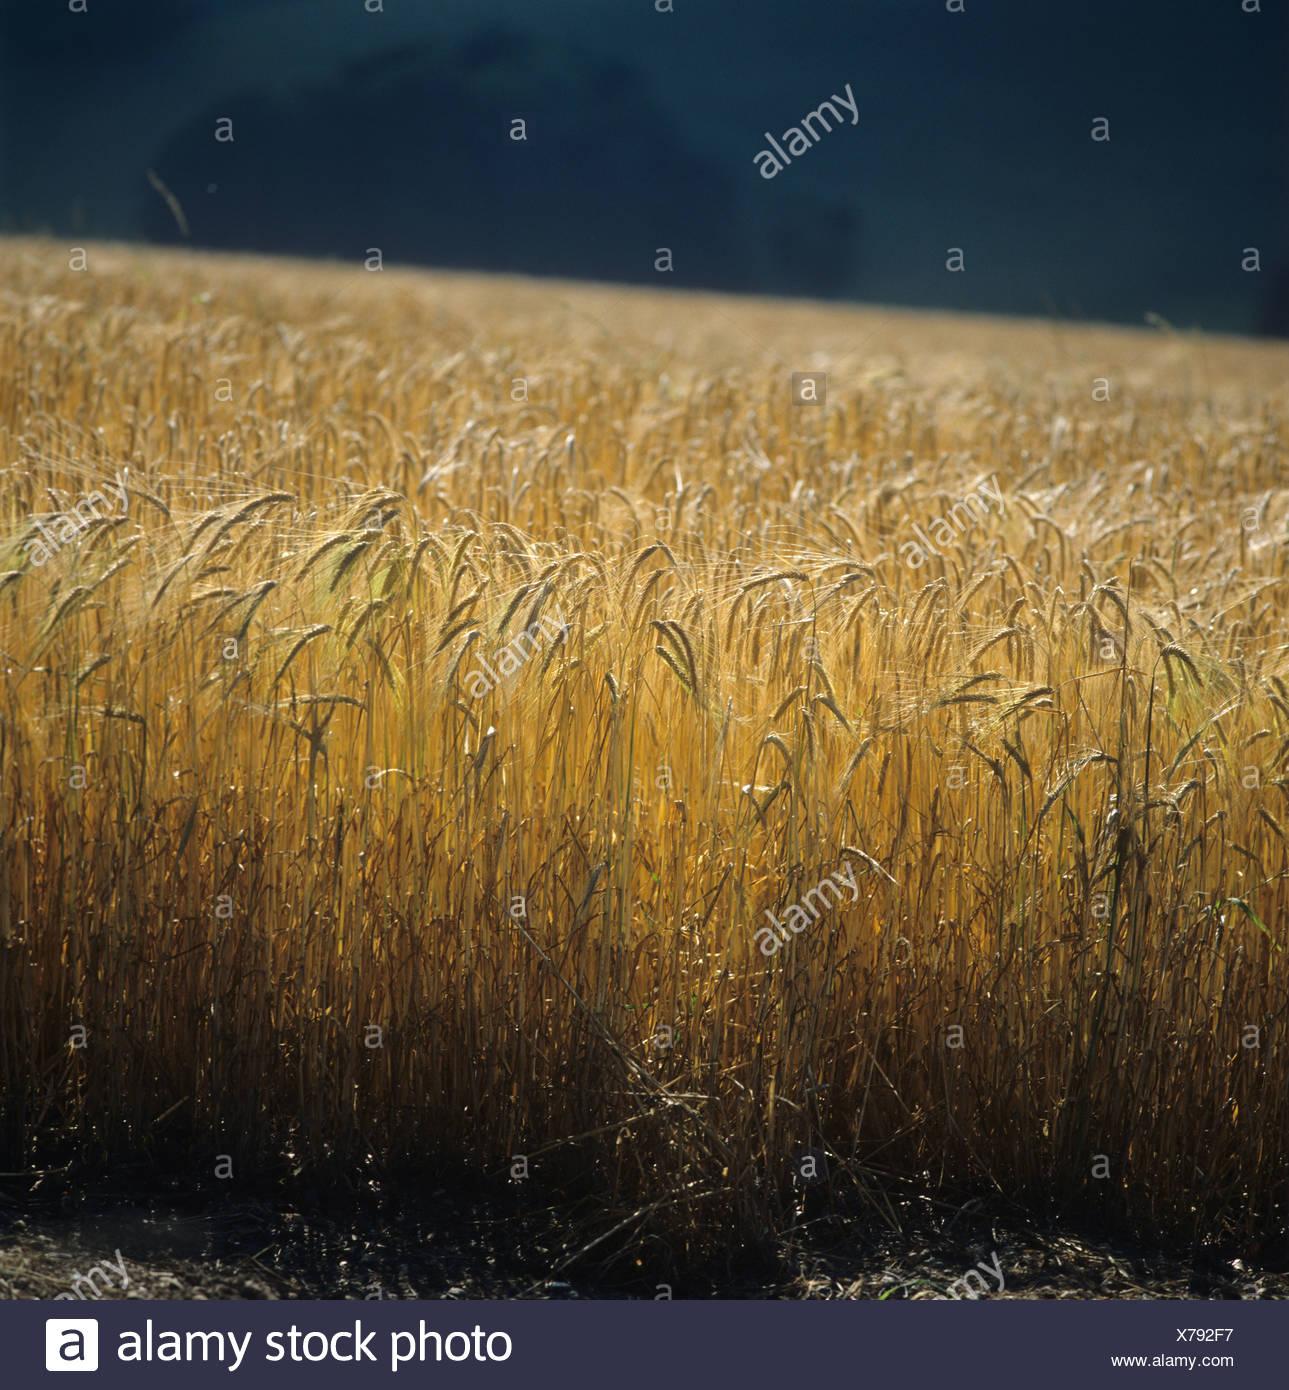 Contre Jour de cebada madura oídos contra un fondo oscuro Imagen De Stock